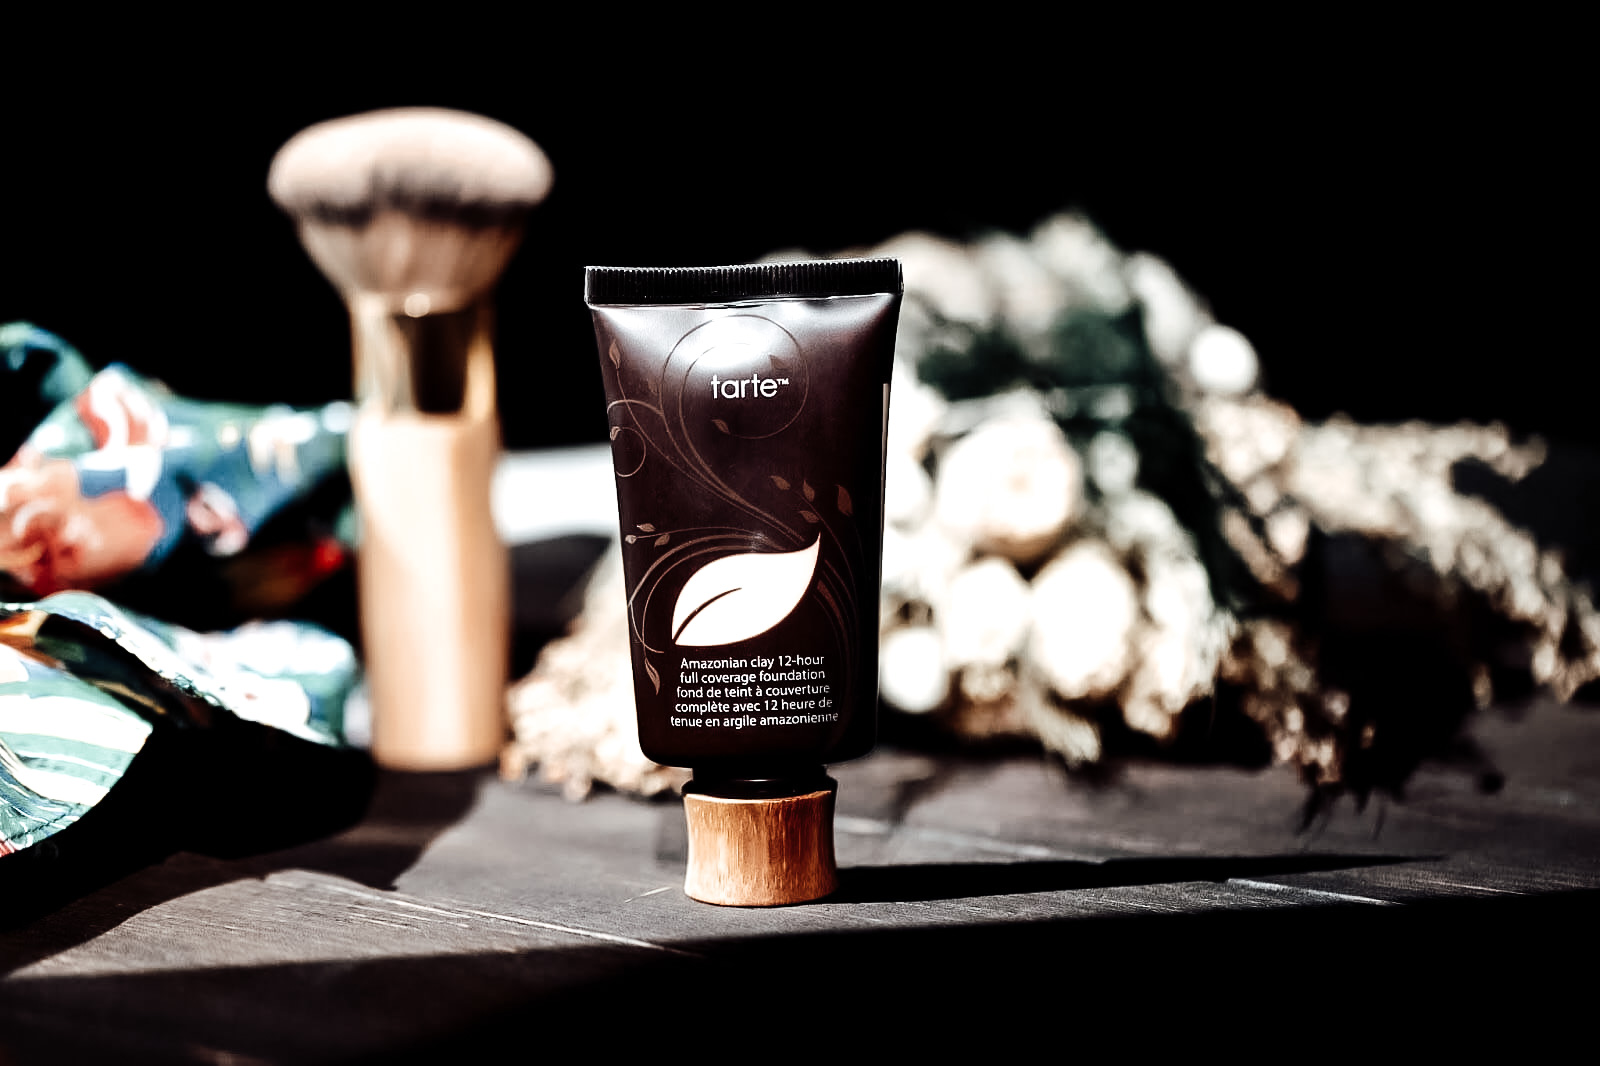 Tarte Amazonian Clay Fond de Teint test